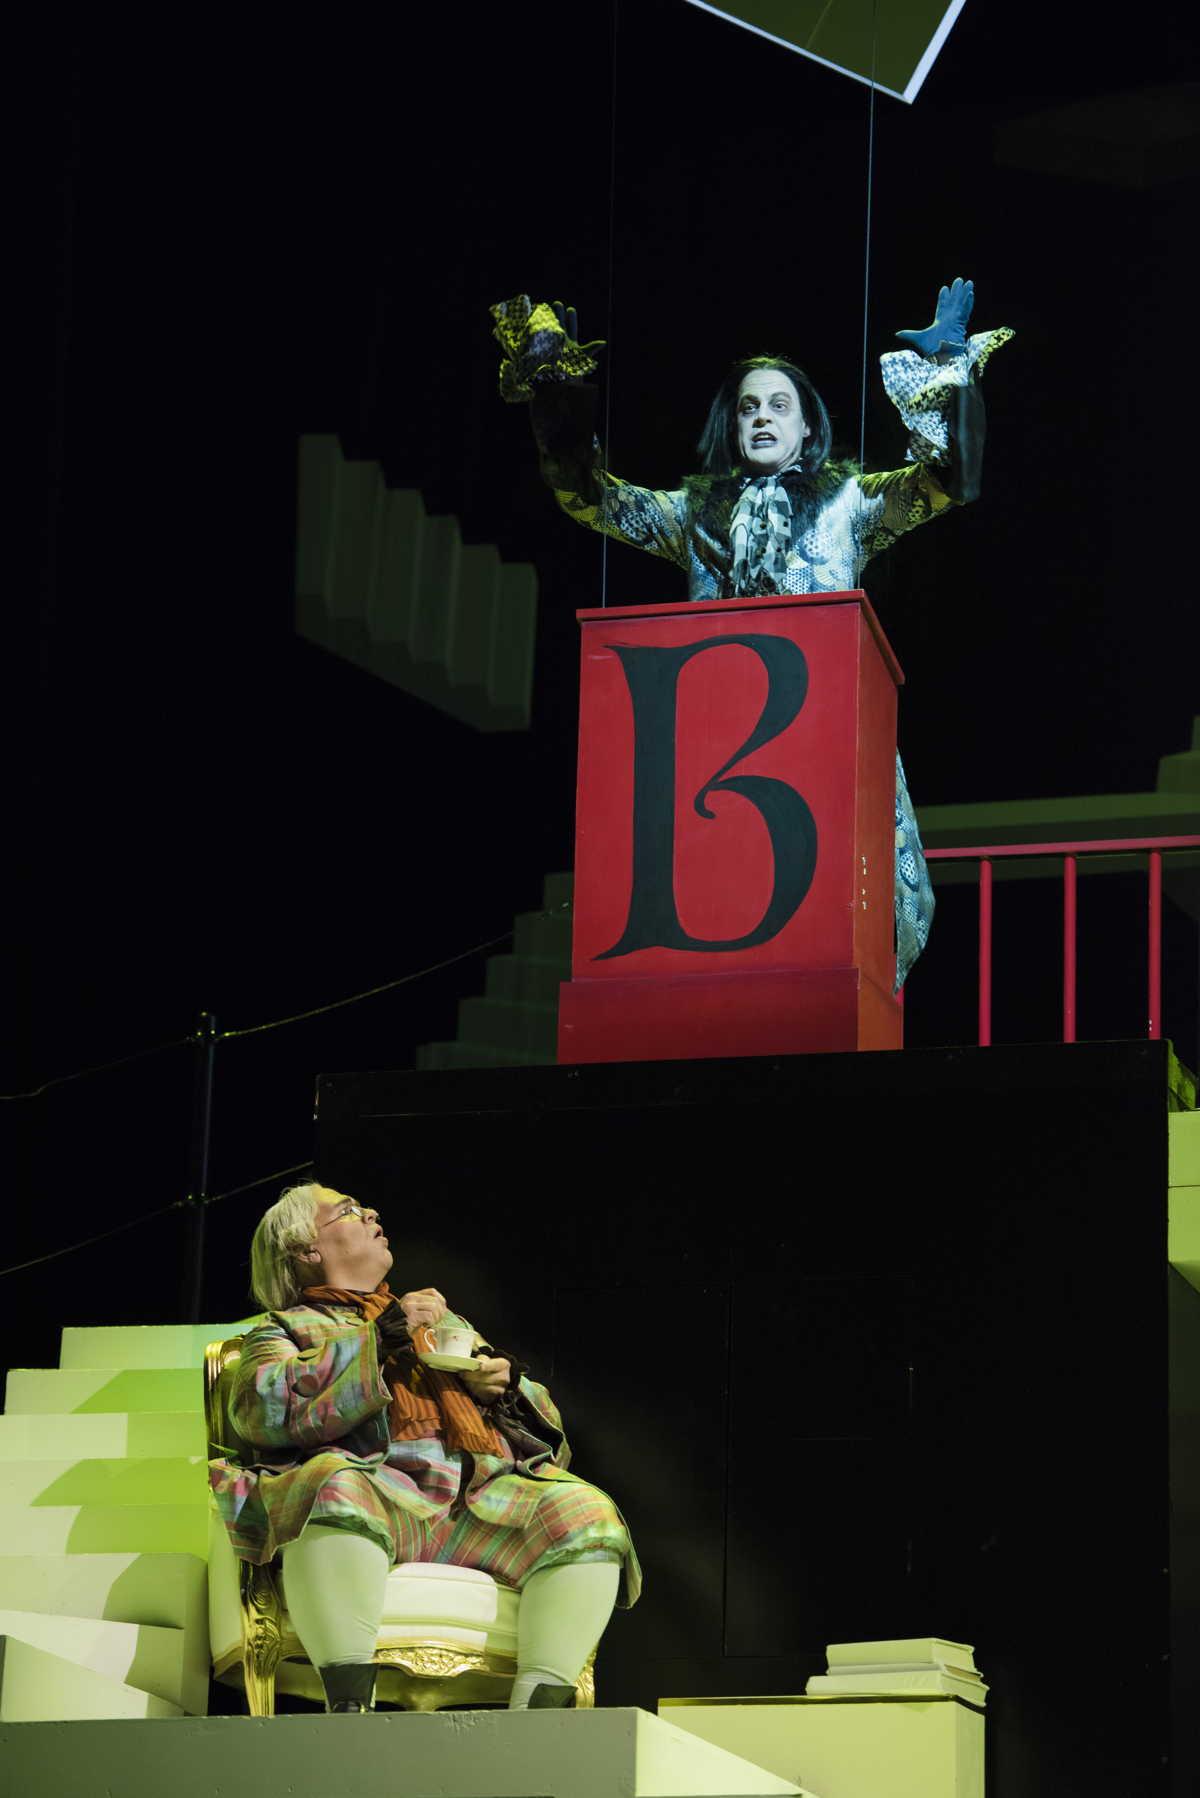 THE BARBER OF SEVILLE | OCT 12-21 – Boston Lyric Opera